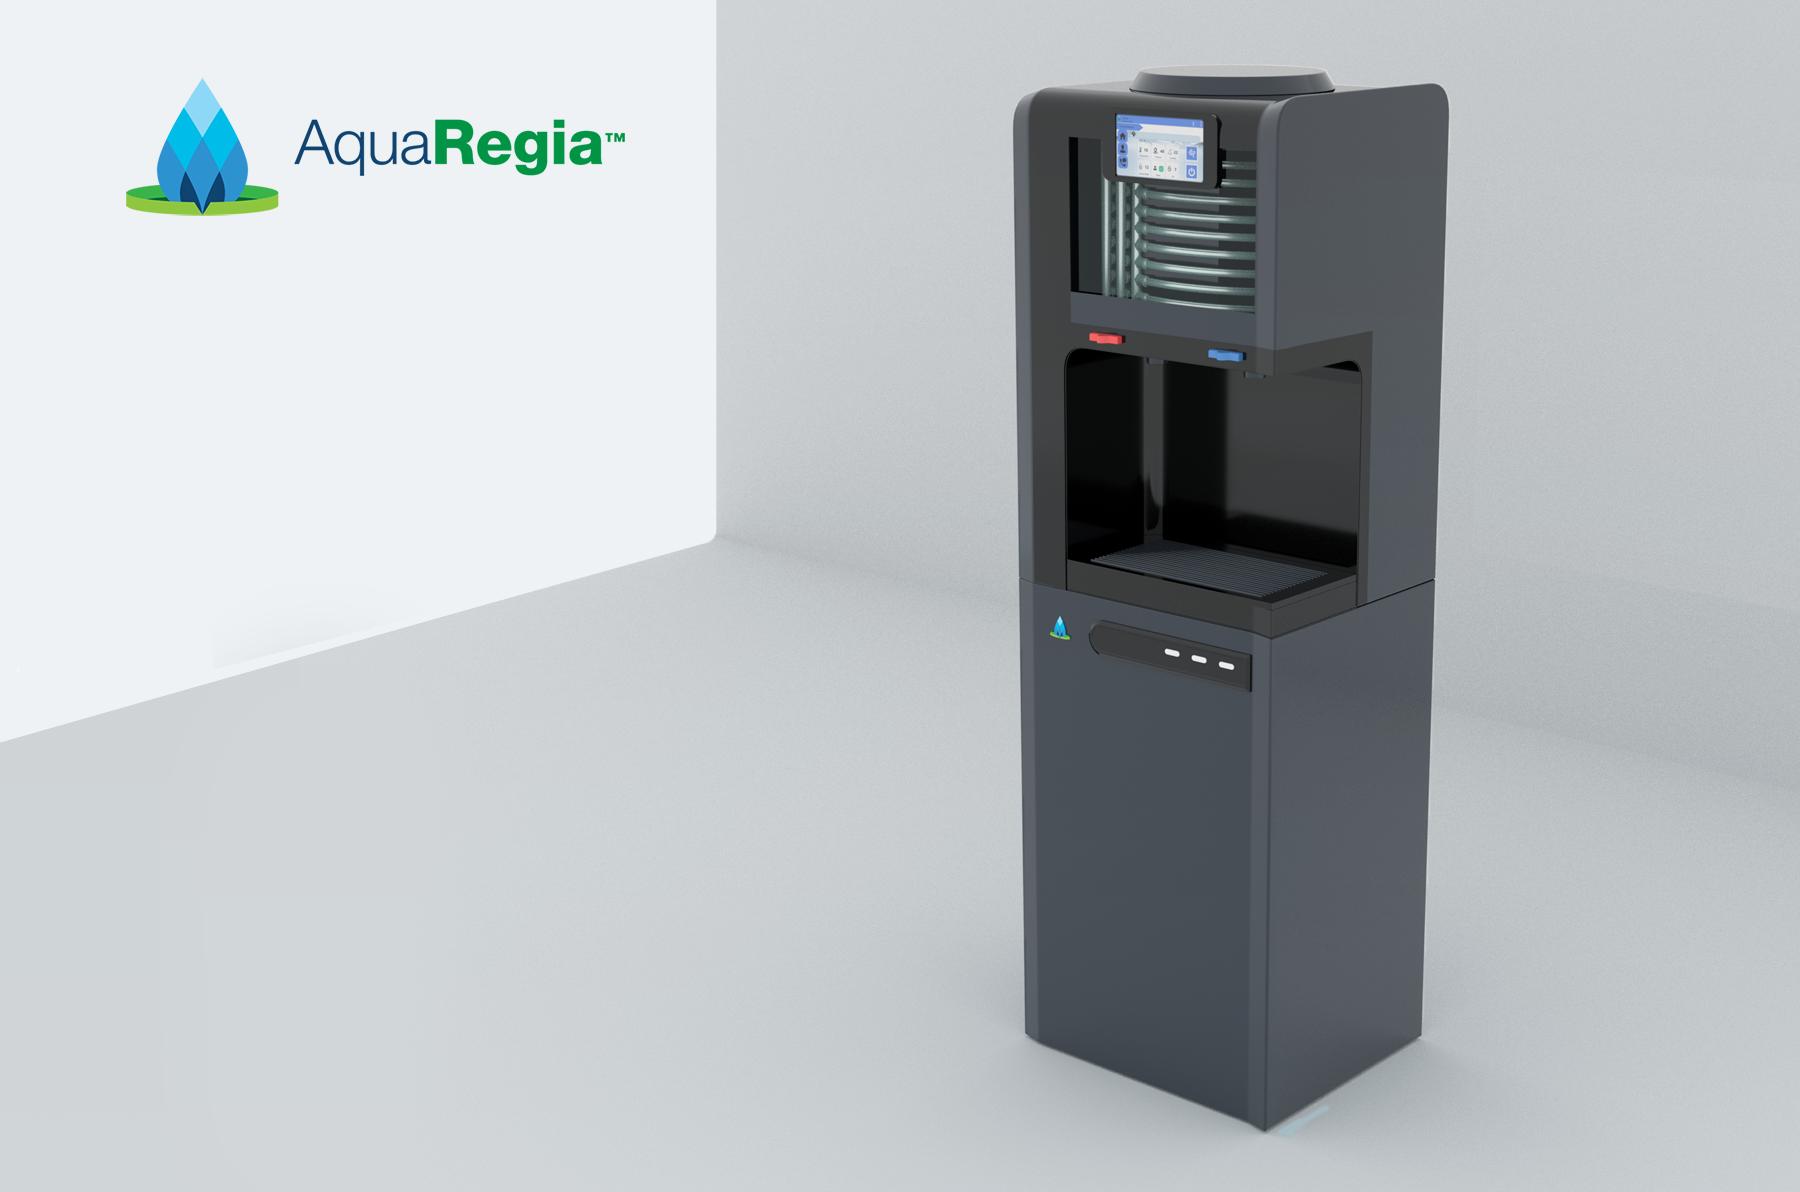 AquaRegia Unit slide 8.png